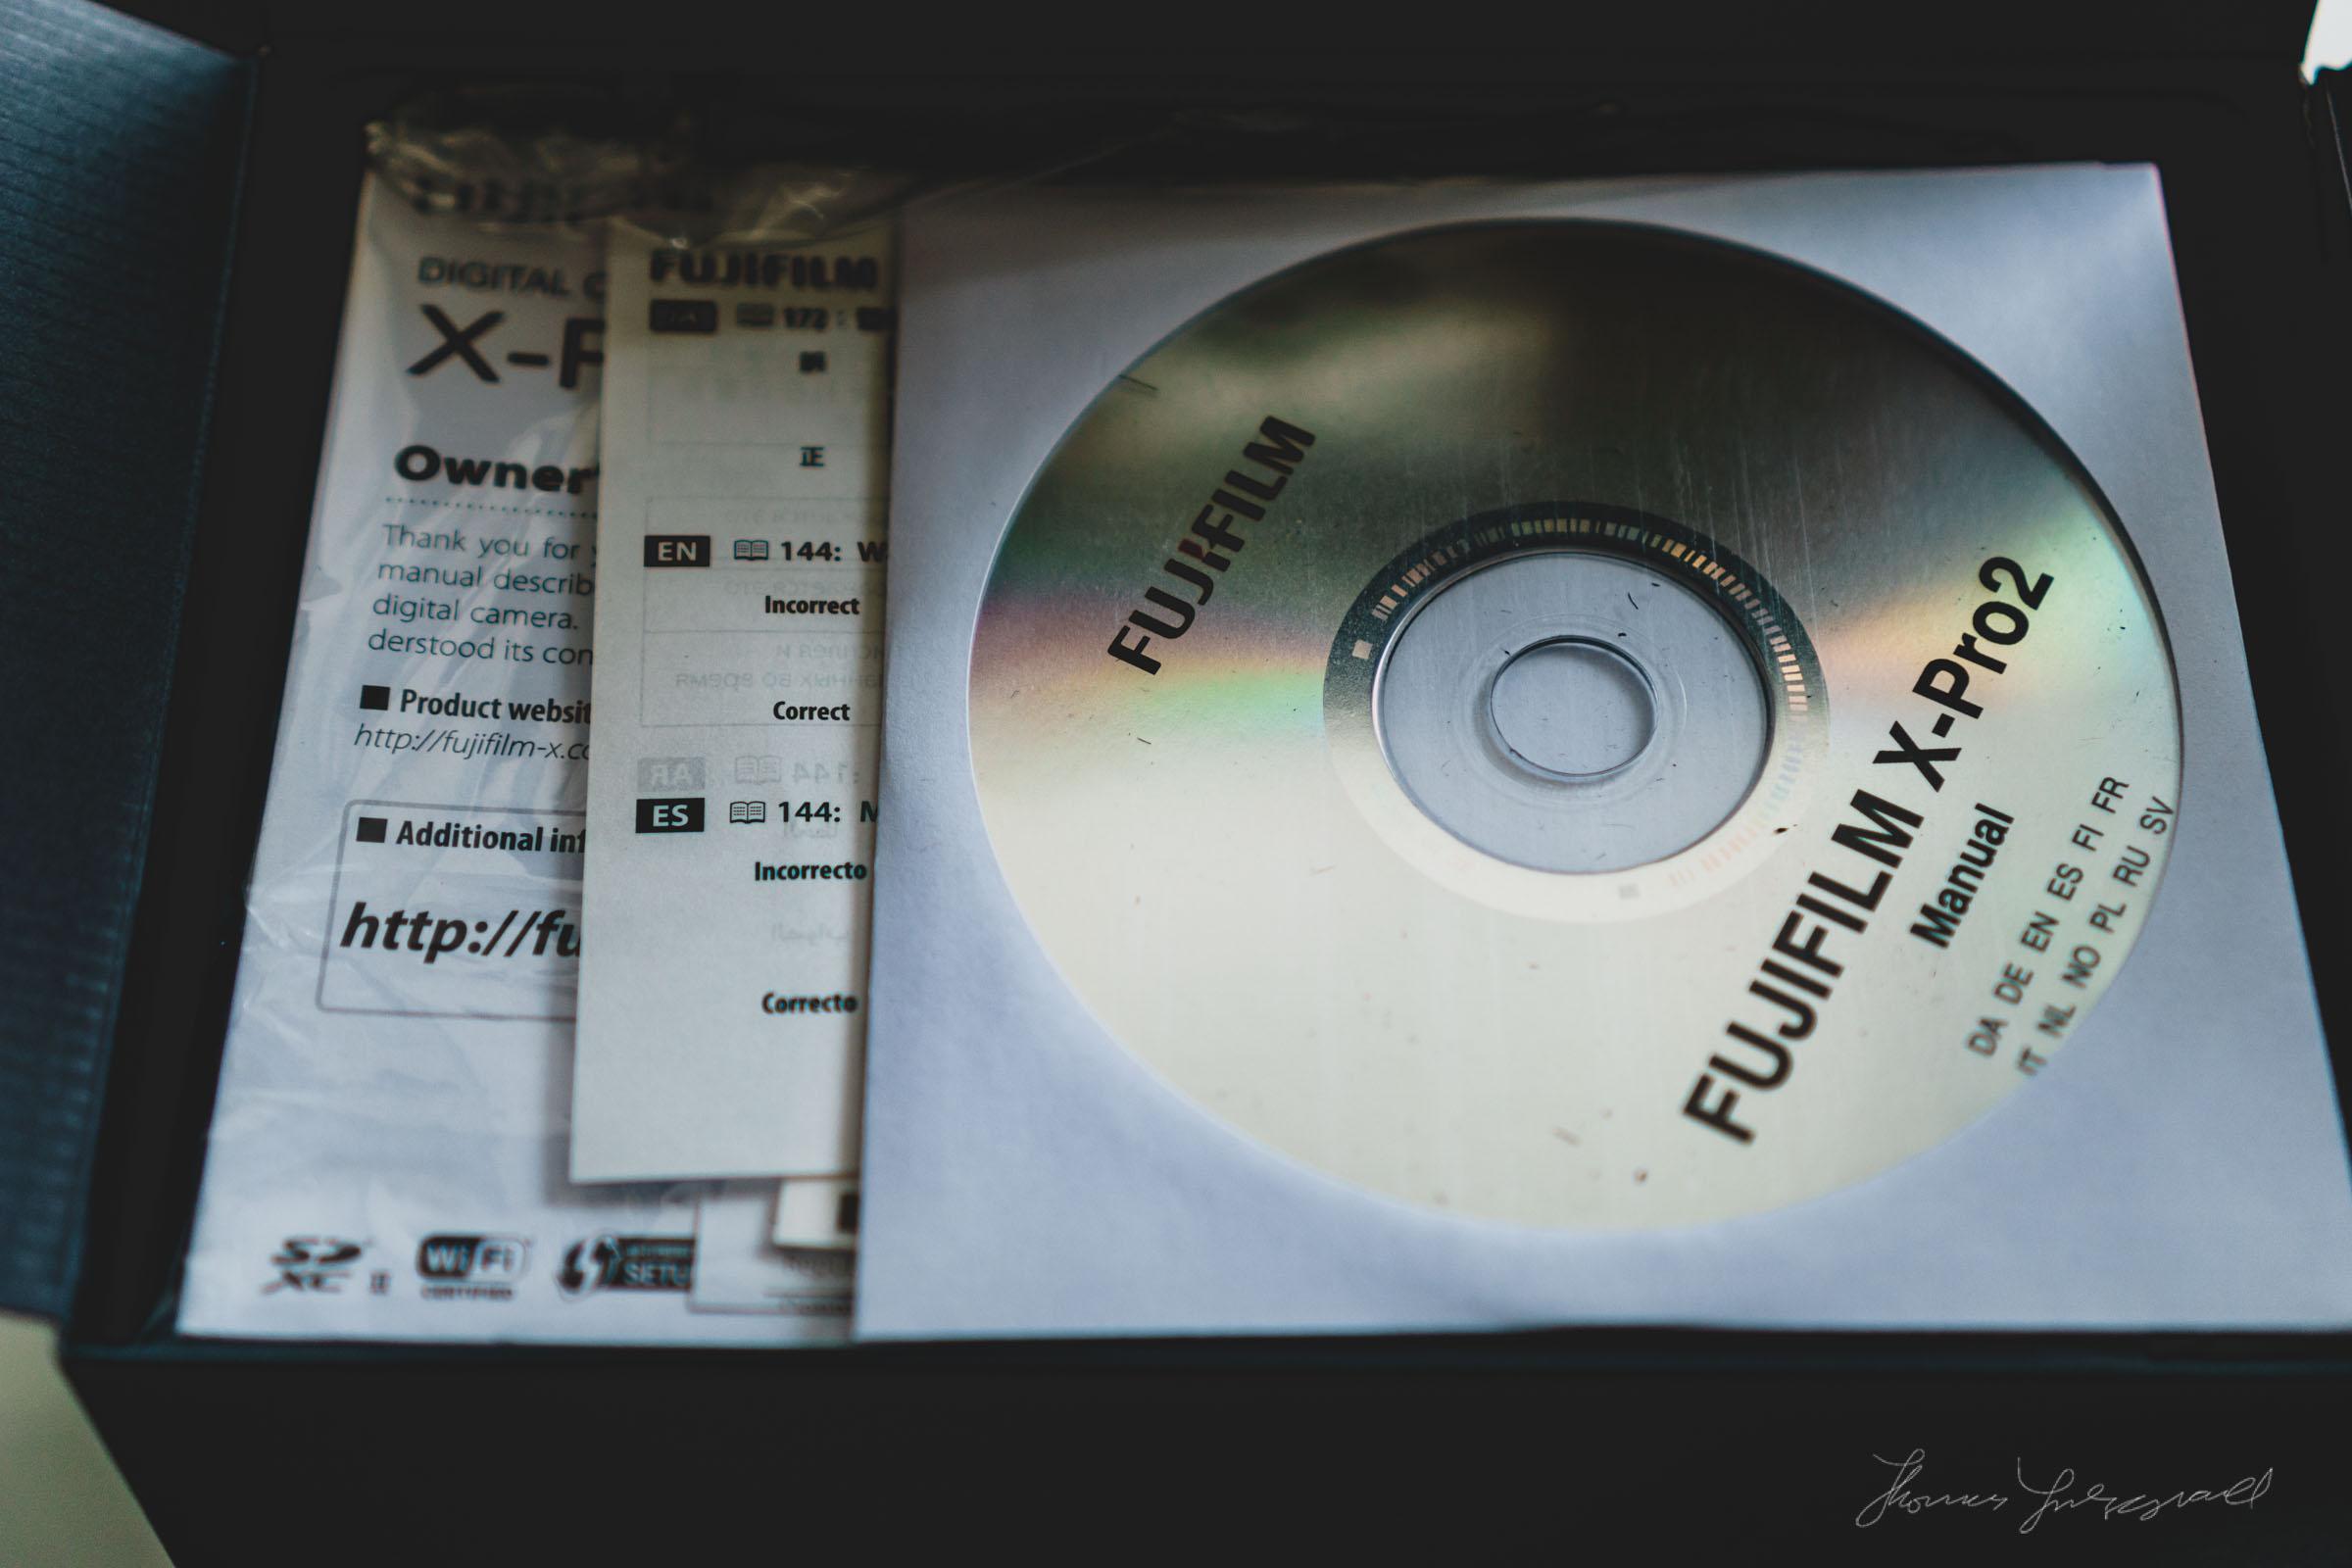 X-Pro2-Unboxing-5.jpg